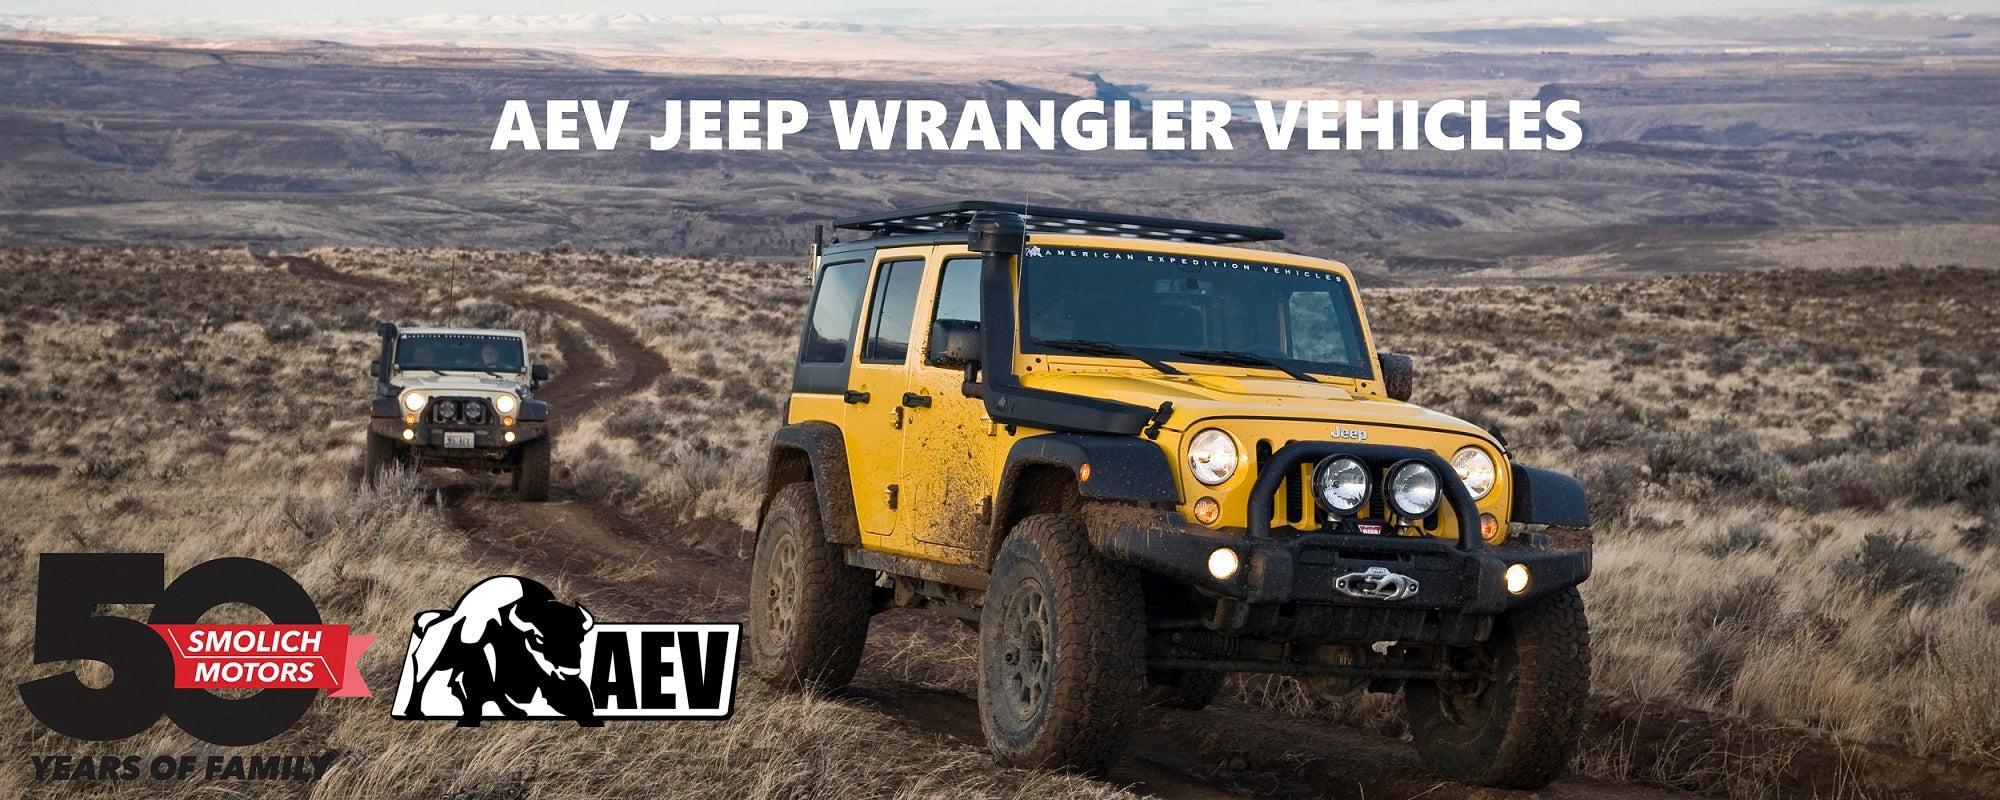 Smolich Motors Bend Or >> American Expedition Vehicles | Chrysler Dealer Serving Bend OR